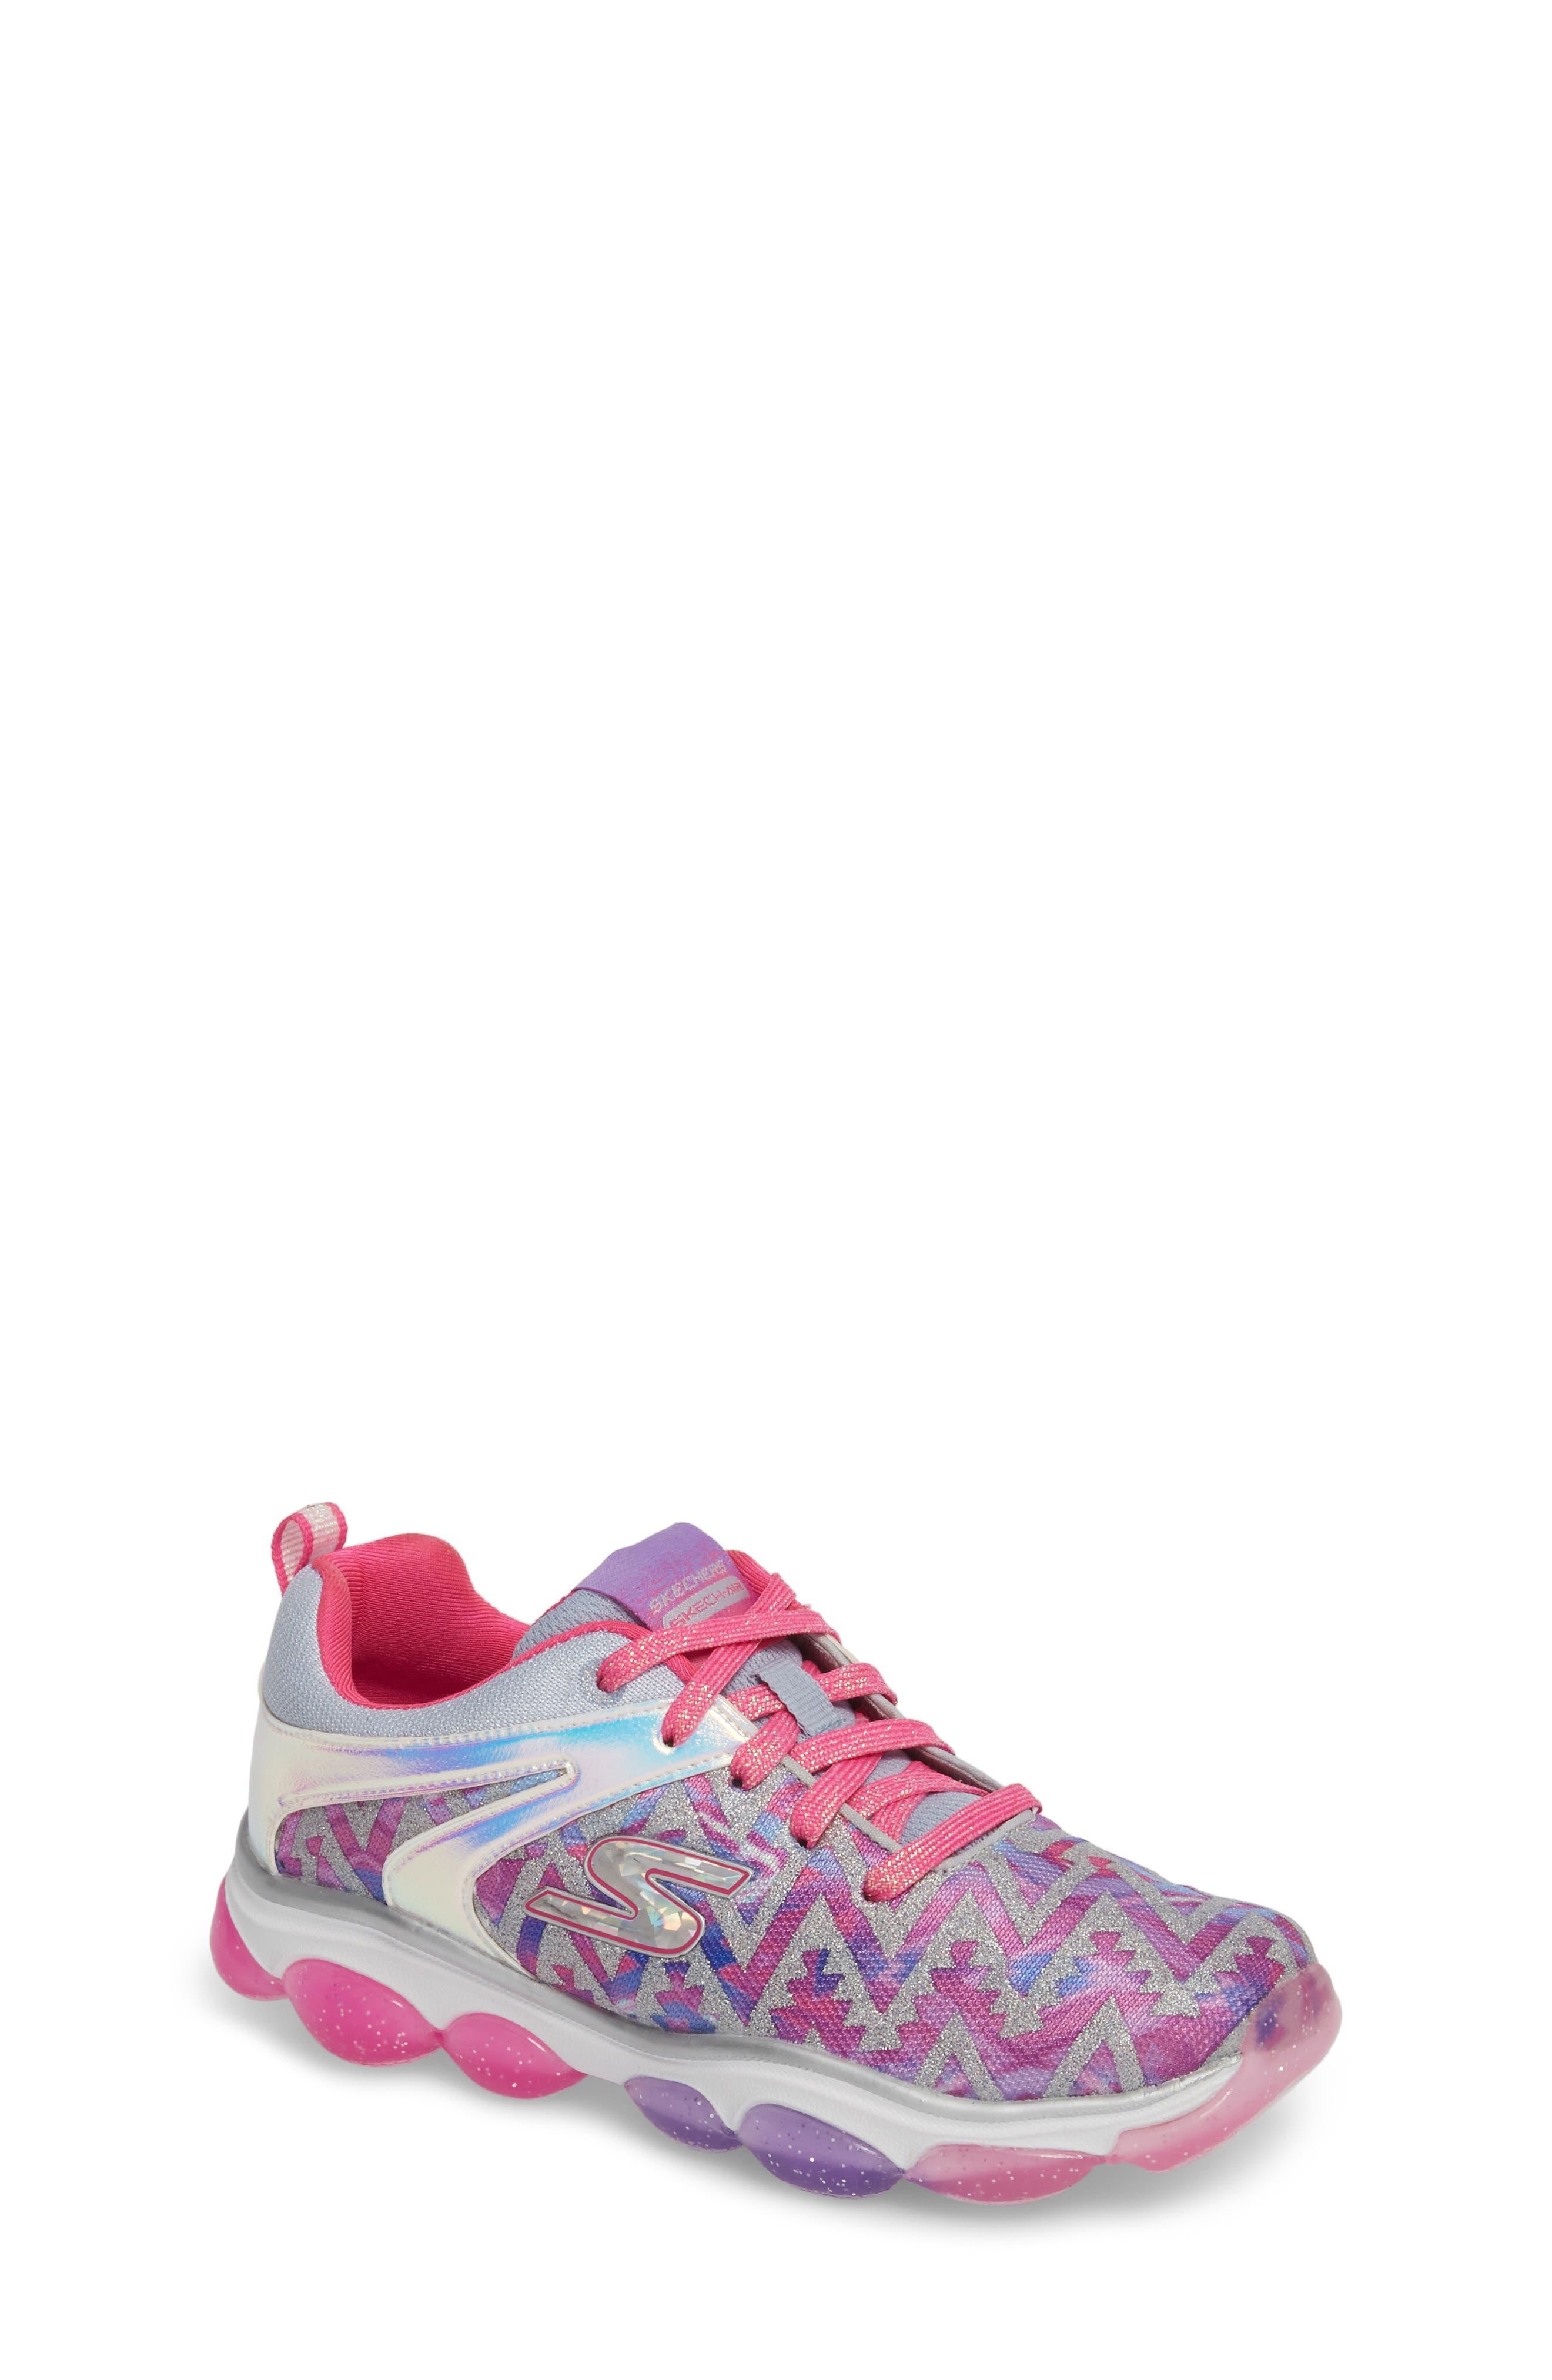 Skech Air Groove Glitter Sneaker,                             Main thumbnail 1, color,                             PINK/ MULTI